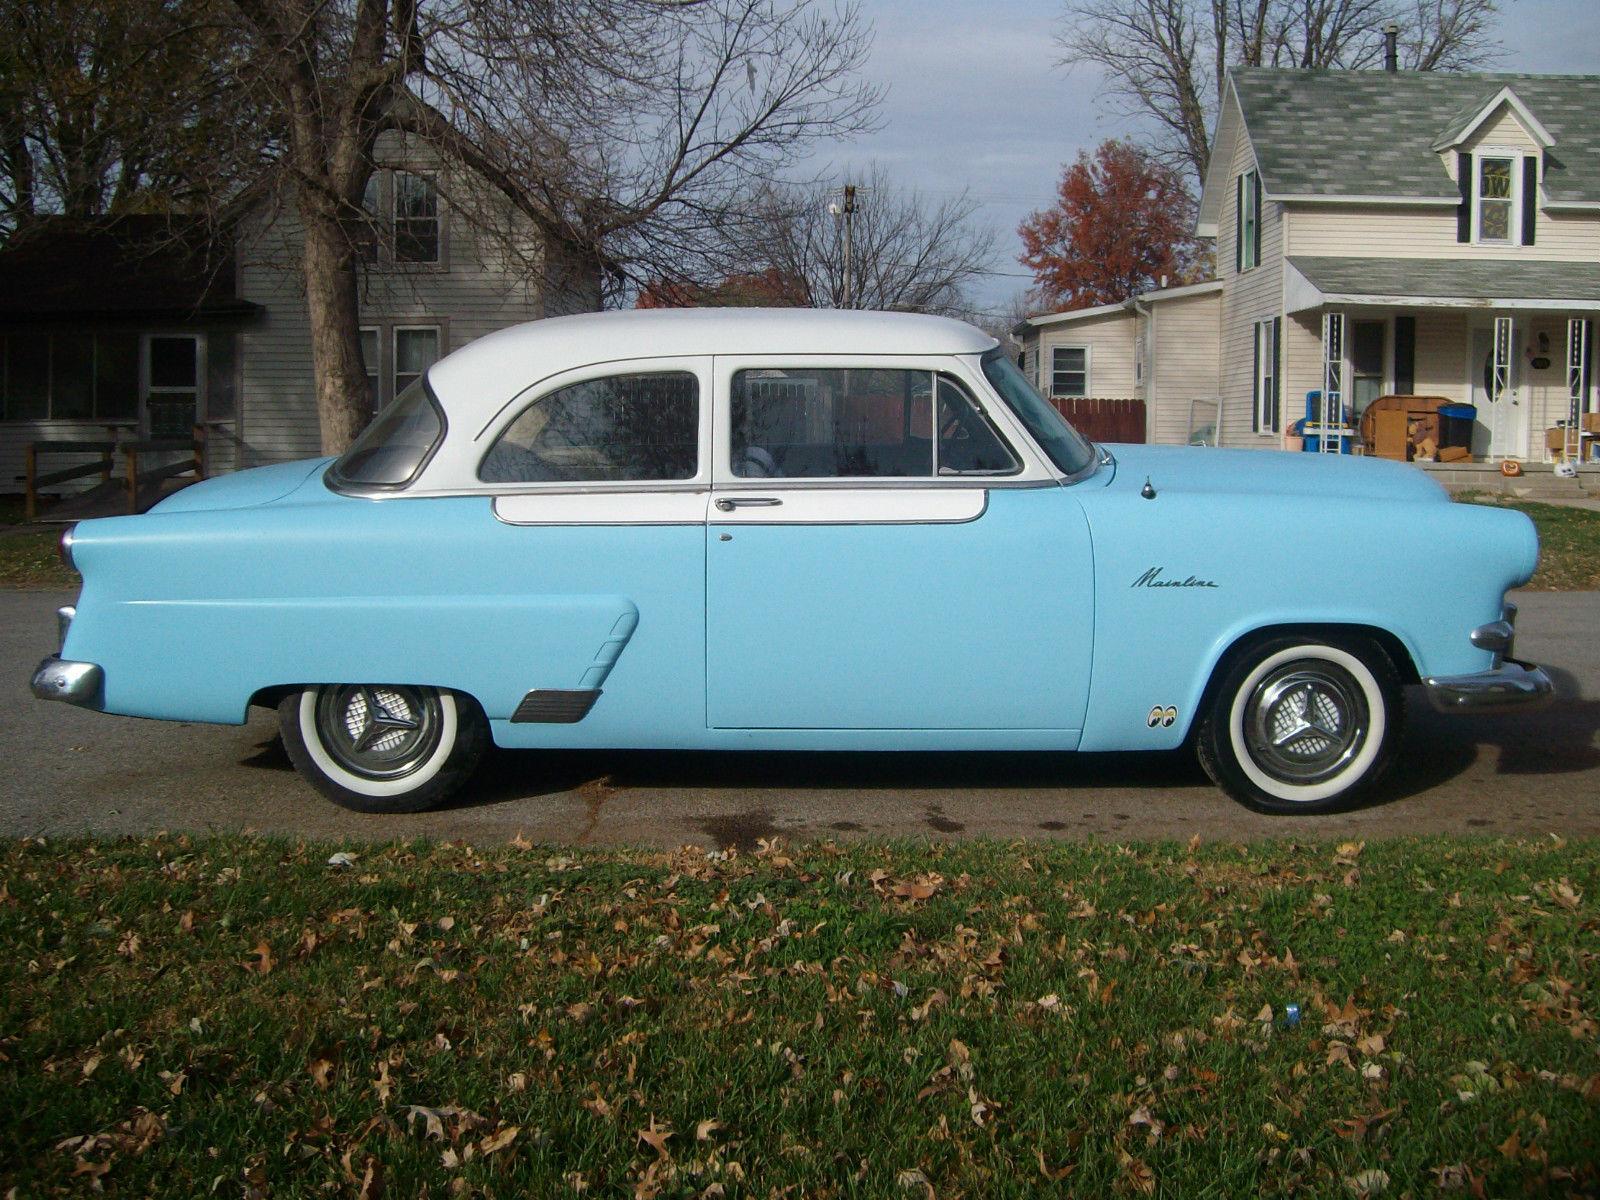 1953 53 Ford Mainline Custom Hot Rod 2 Door Sedan Cruiser